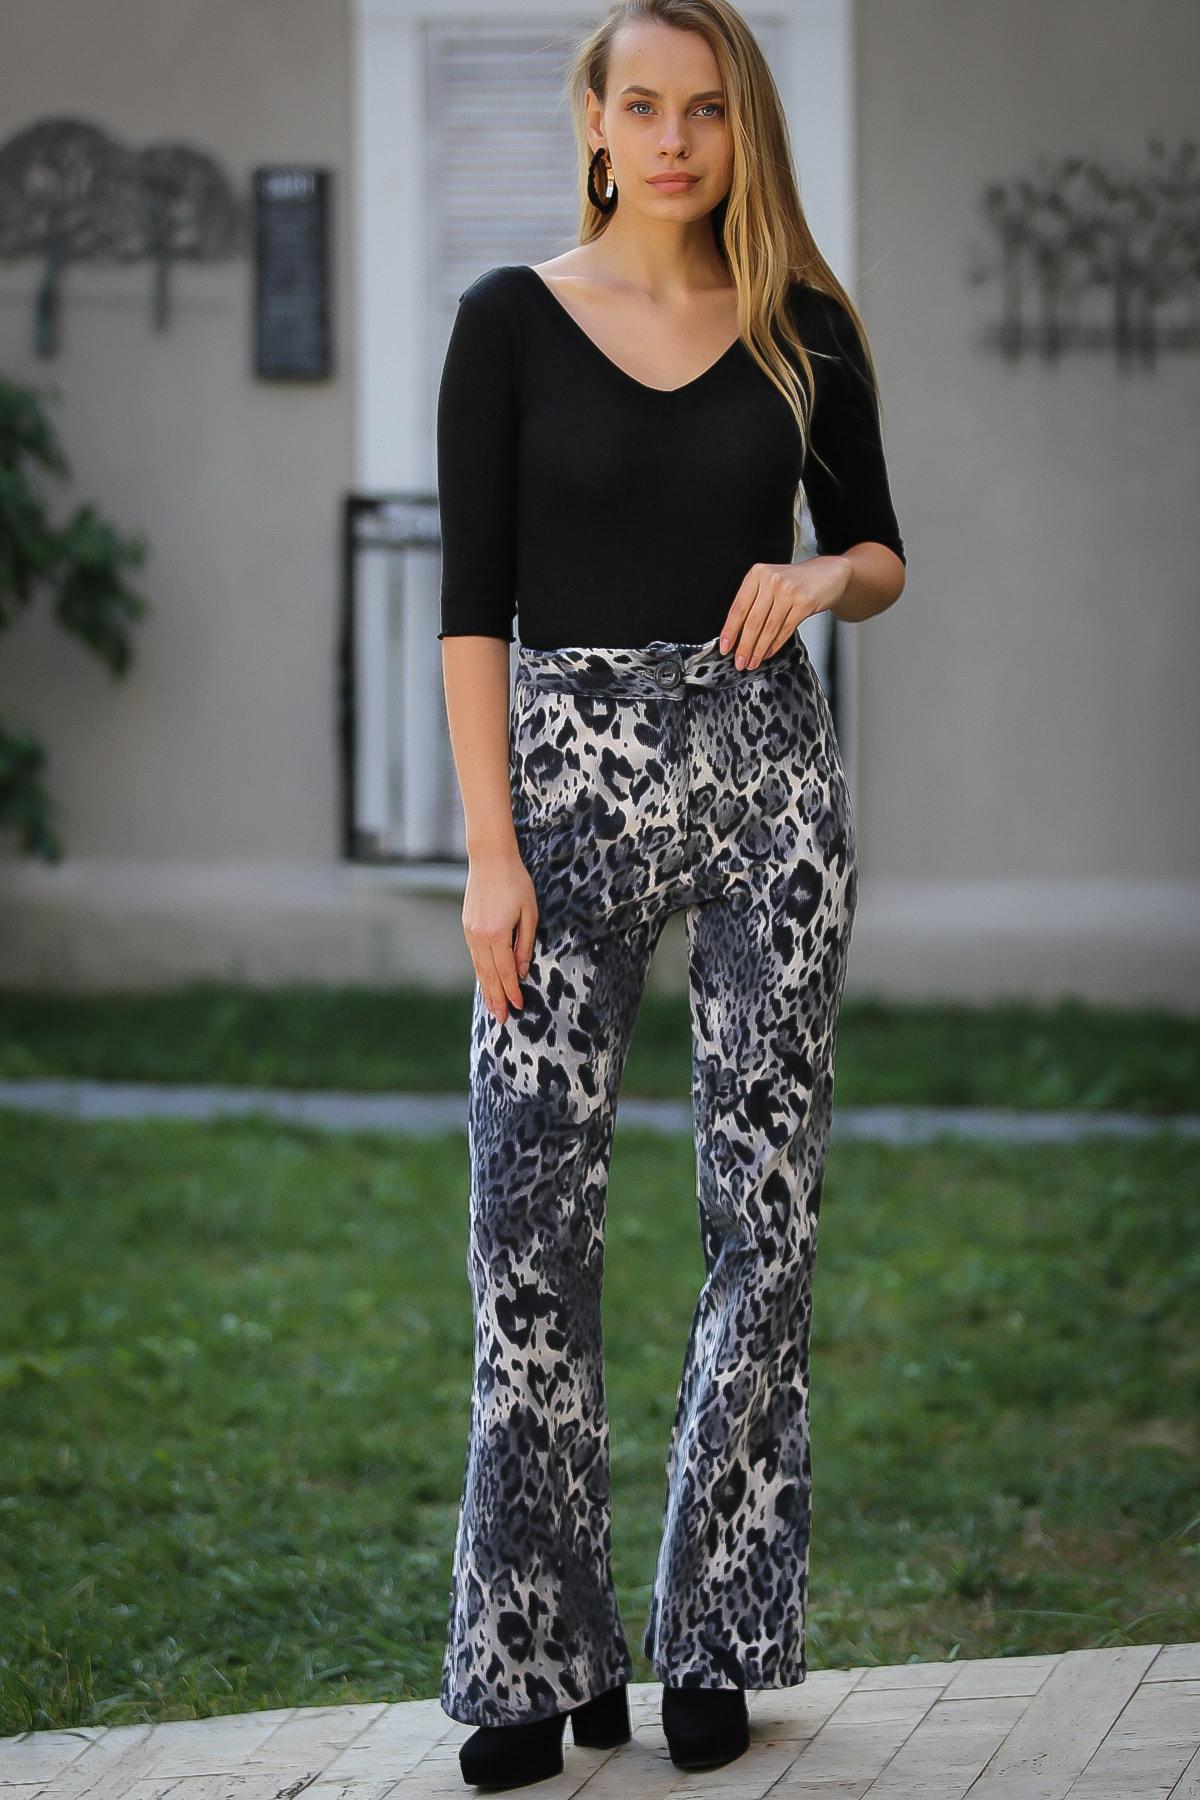 Chiccy Kadın Leopar Desenli Füme İspanyol Paça Pantolon M10060000PN99234